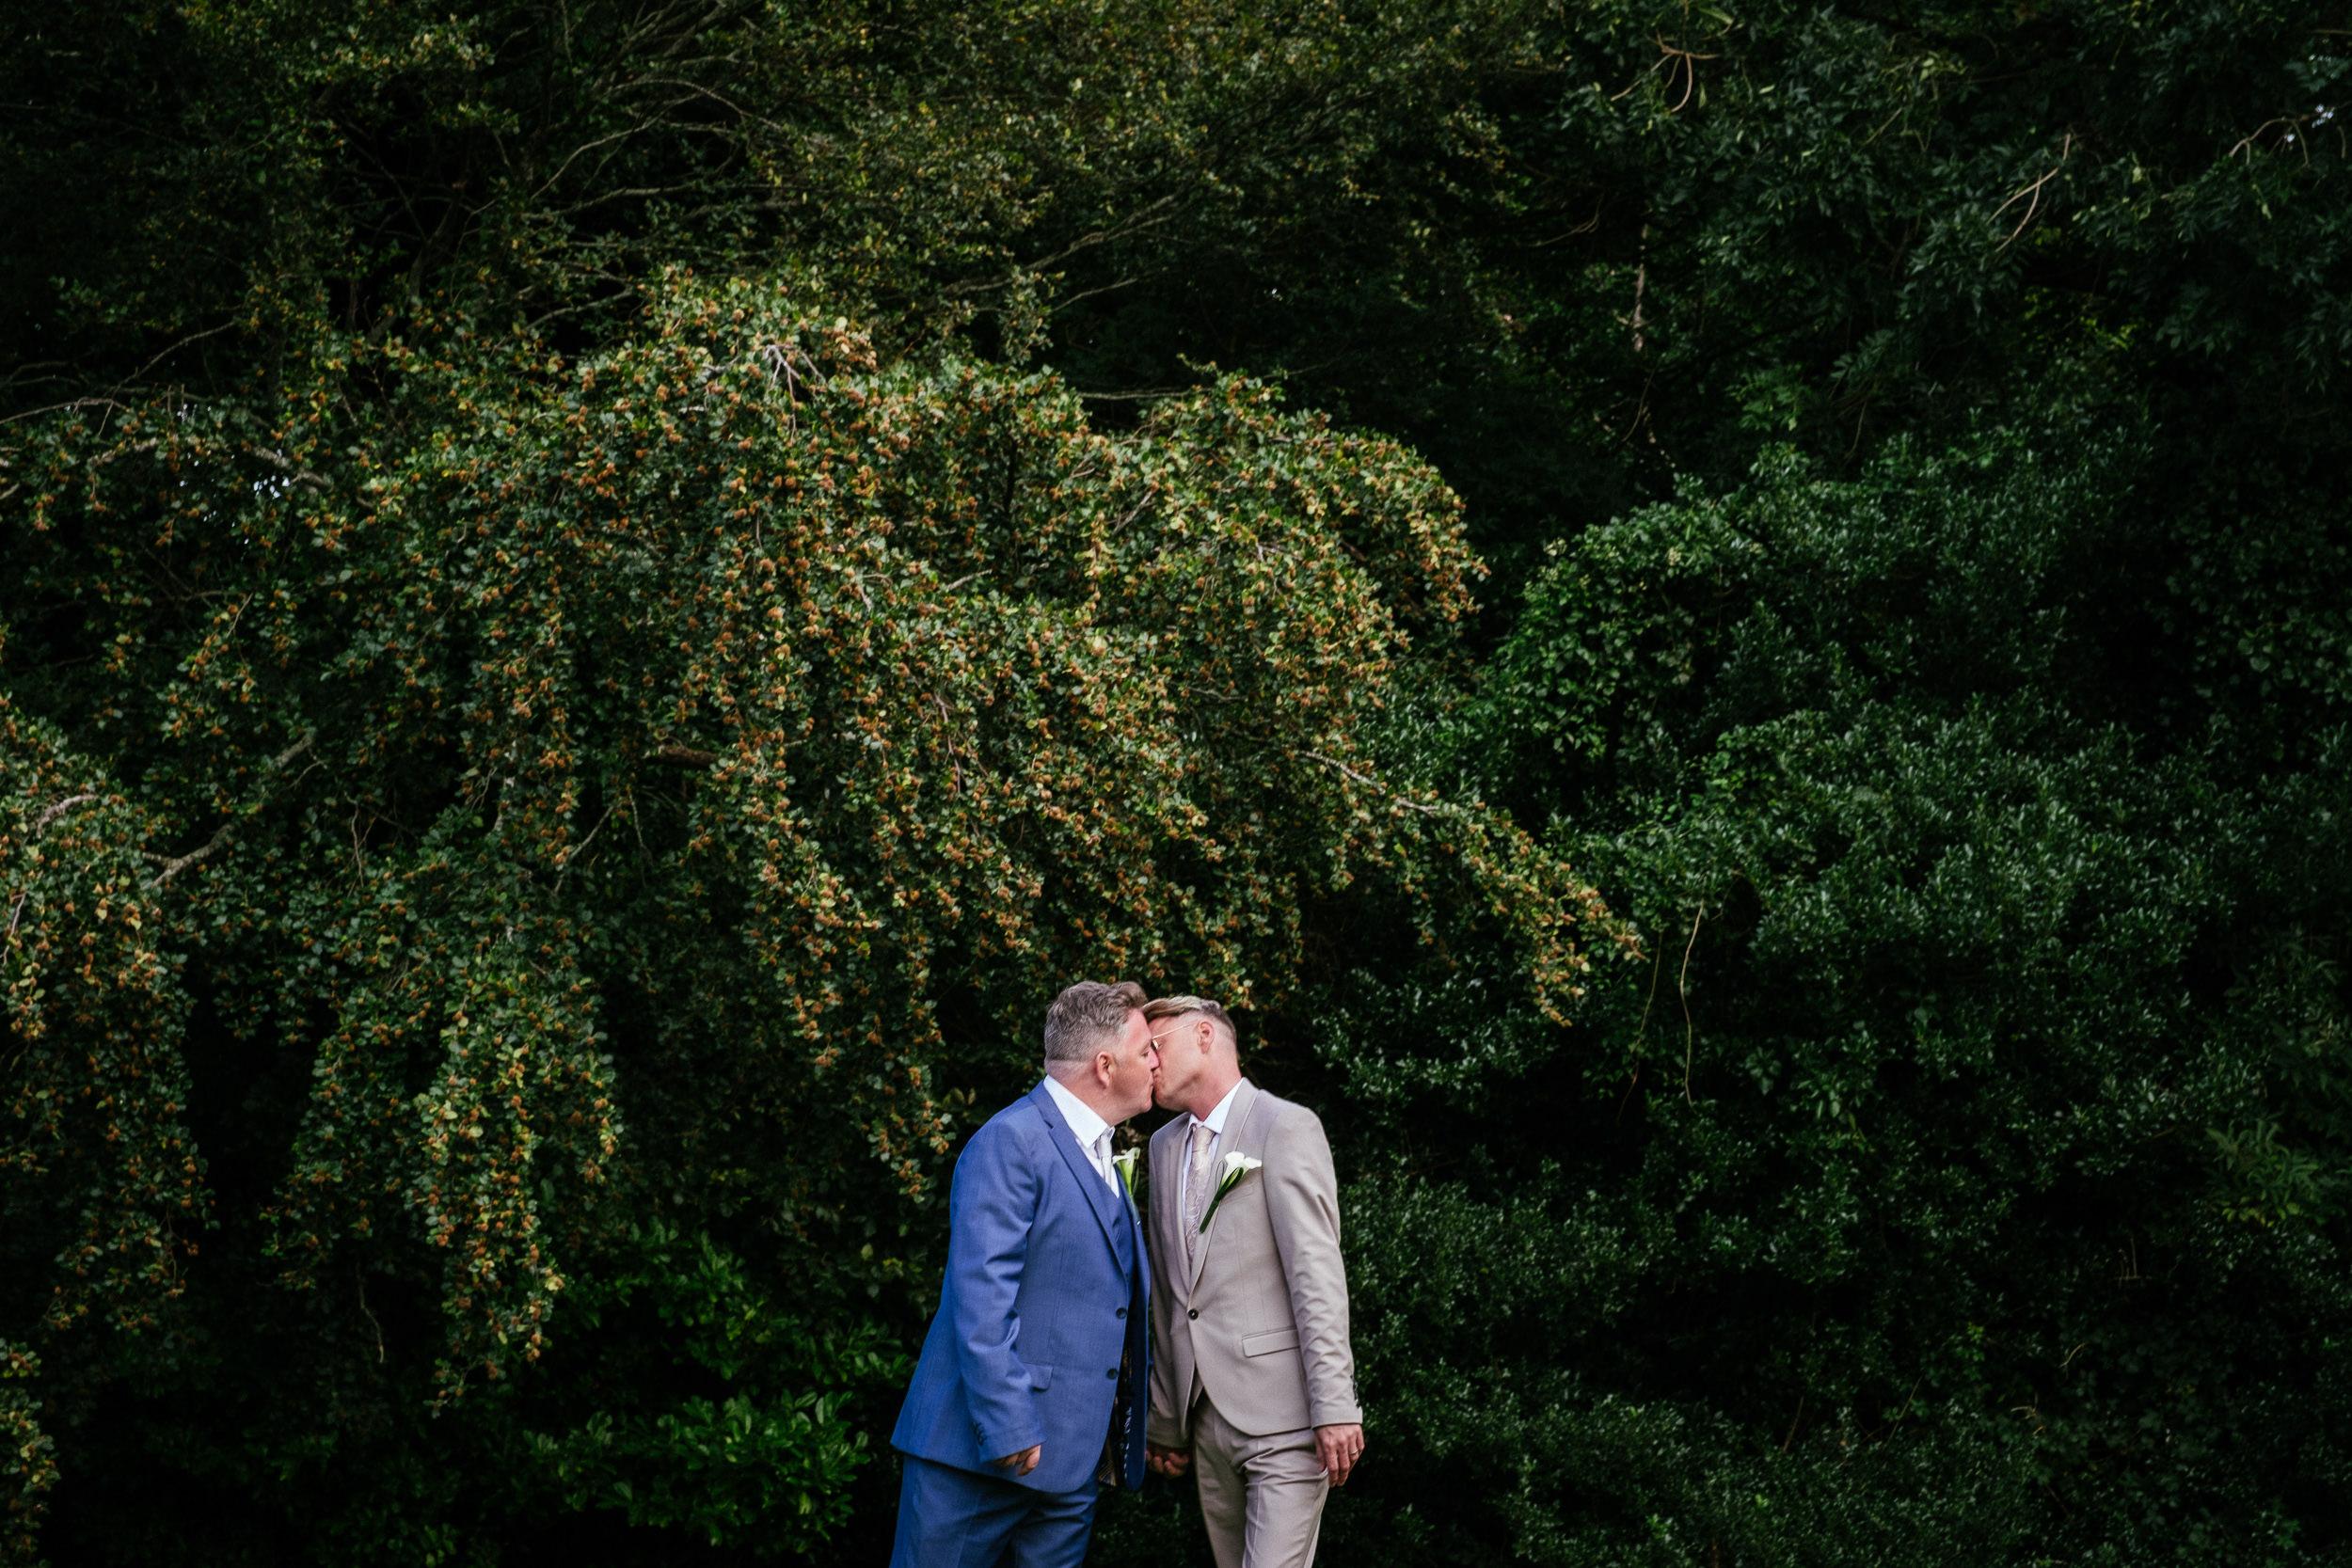 radisson blu stillorgan dublin Wedding Photographer 61